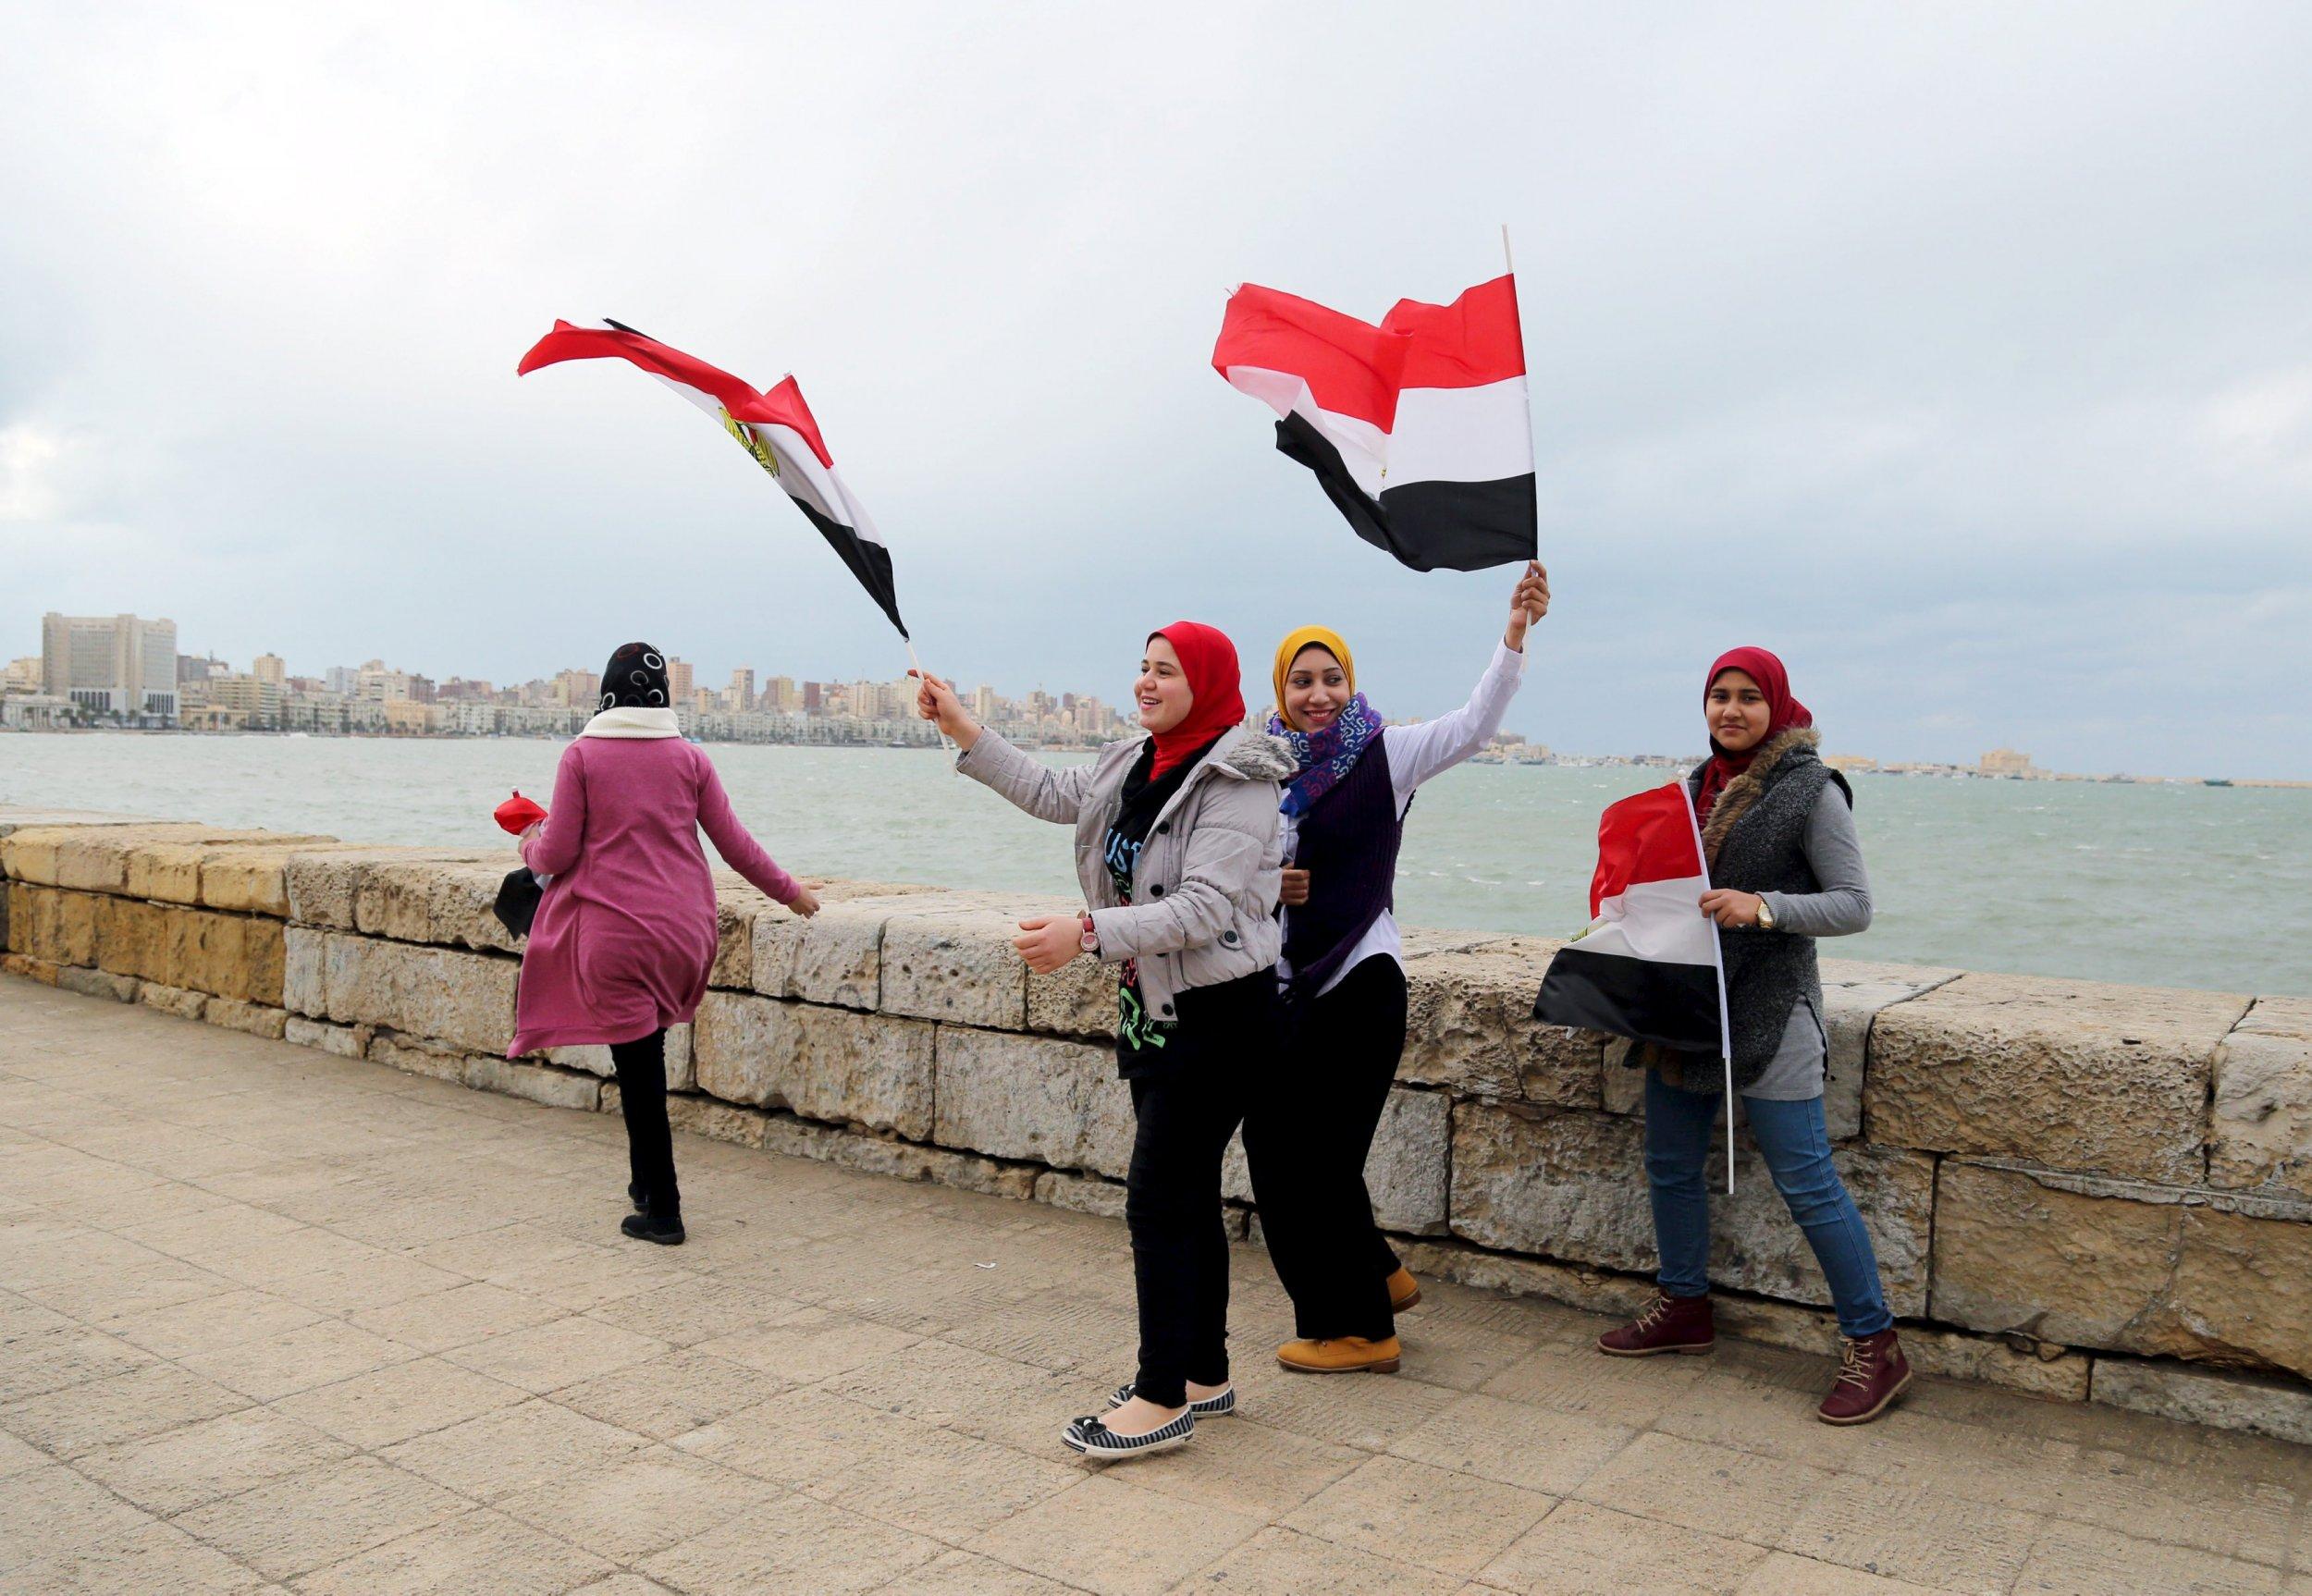 fifth-anniversary-egypts-2011-uprising_0